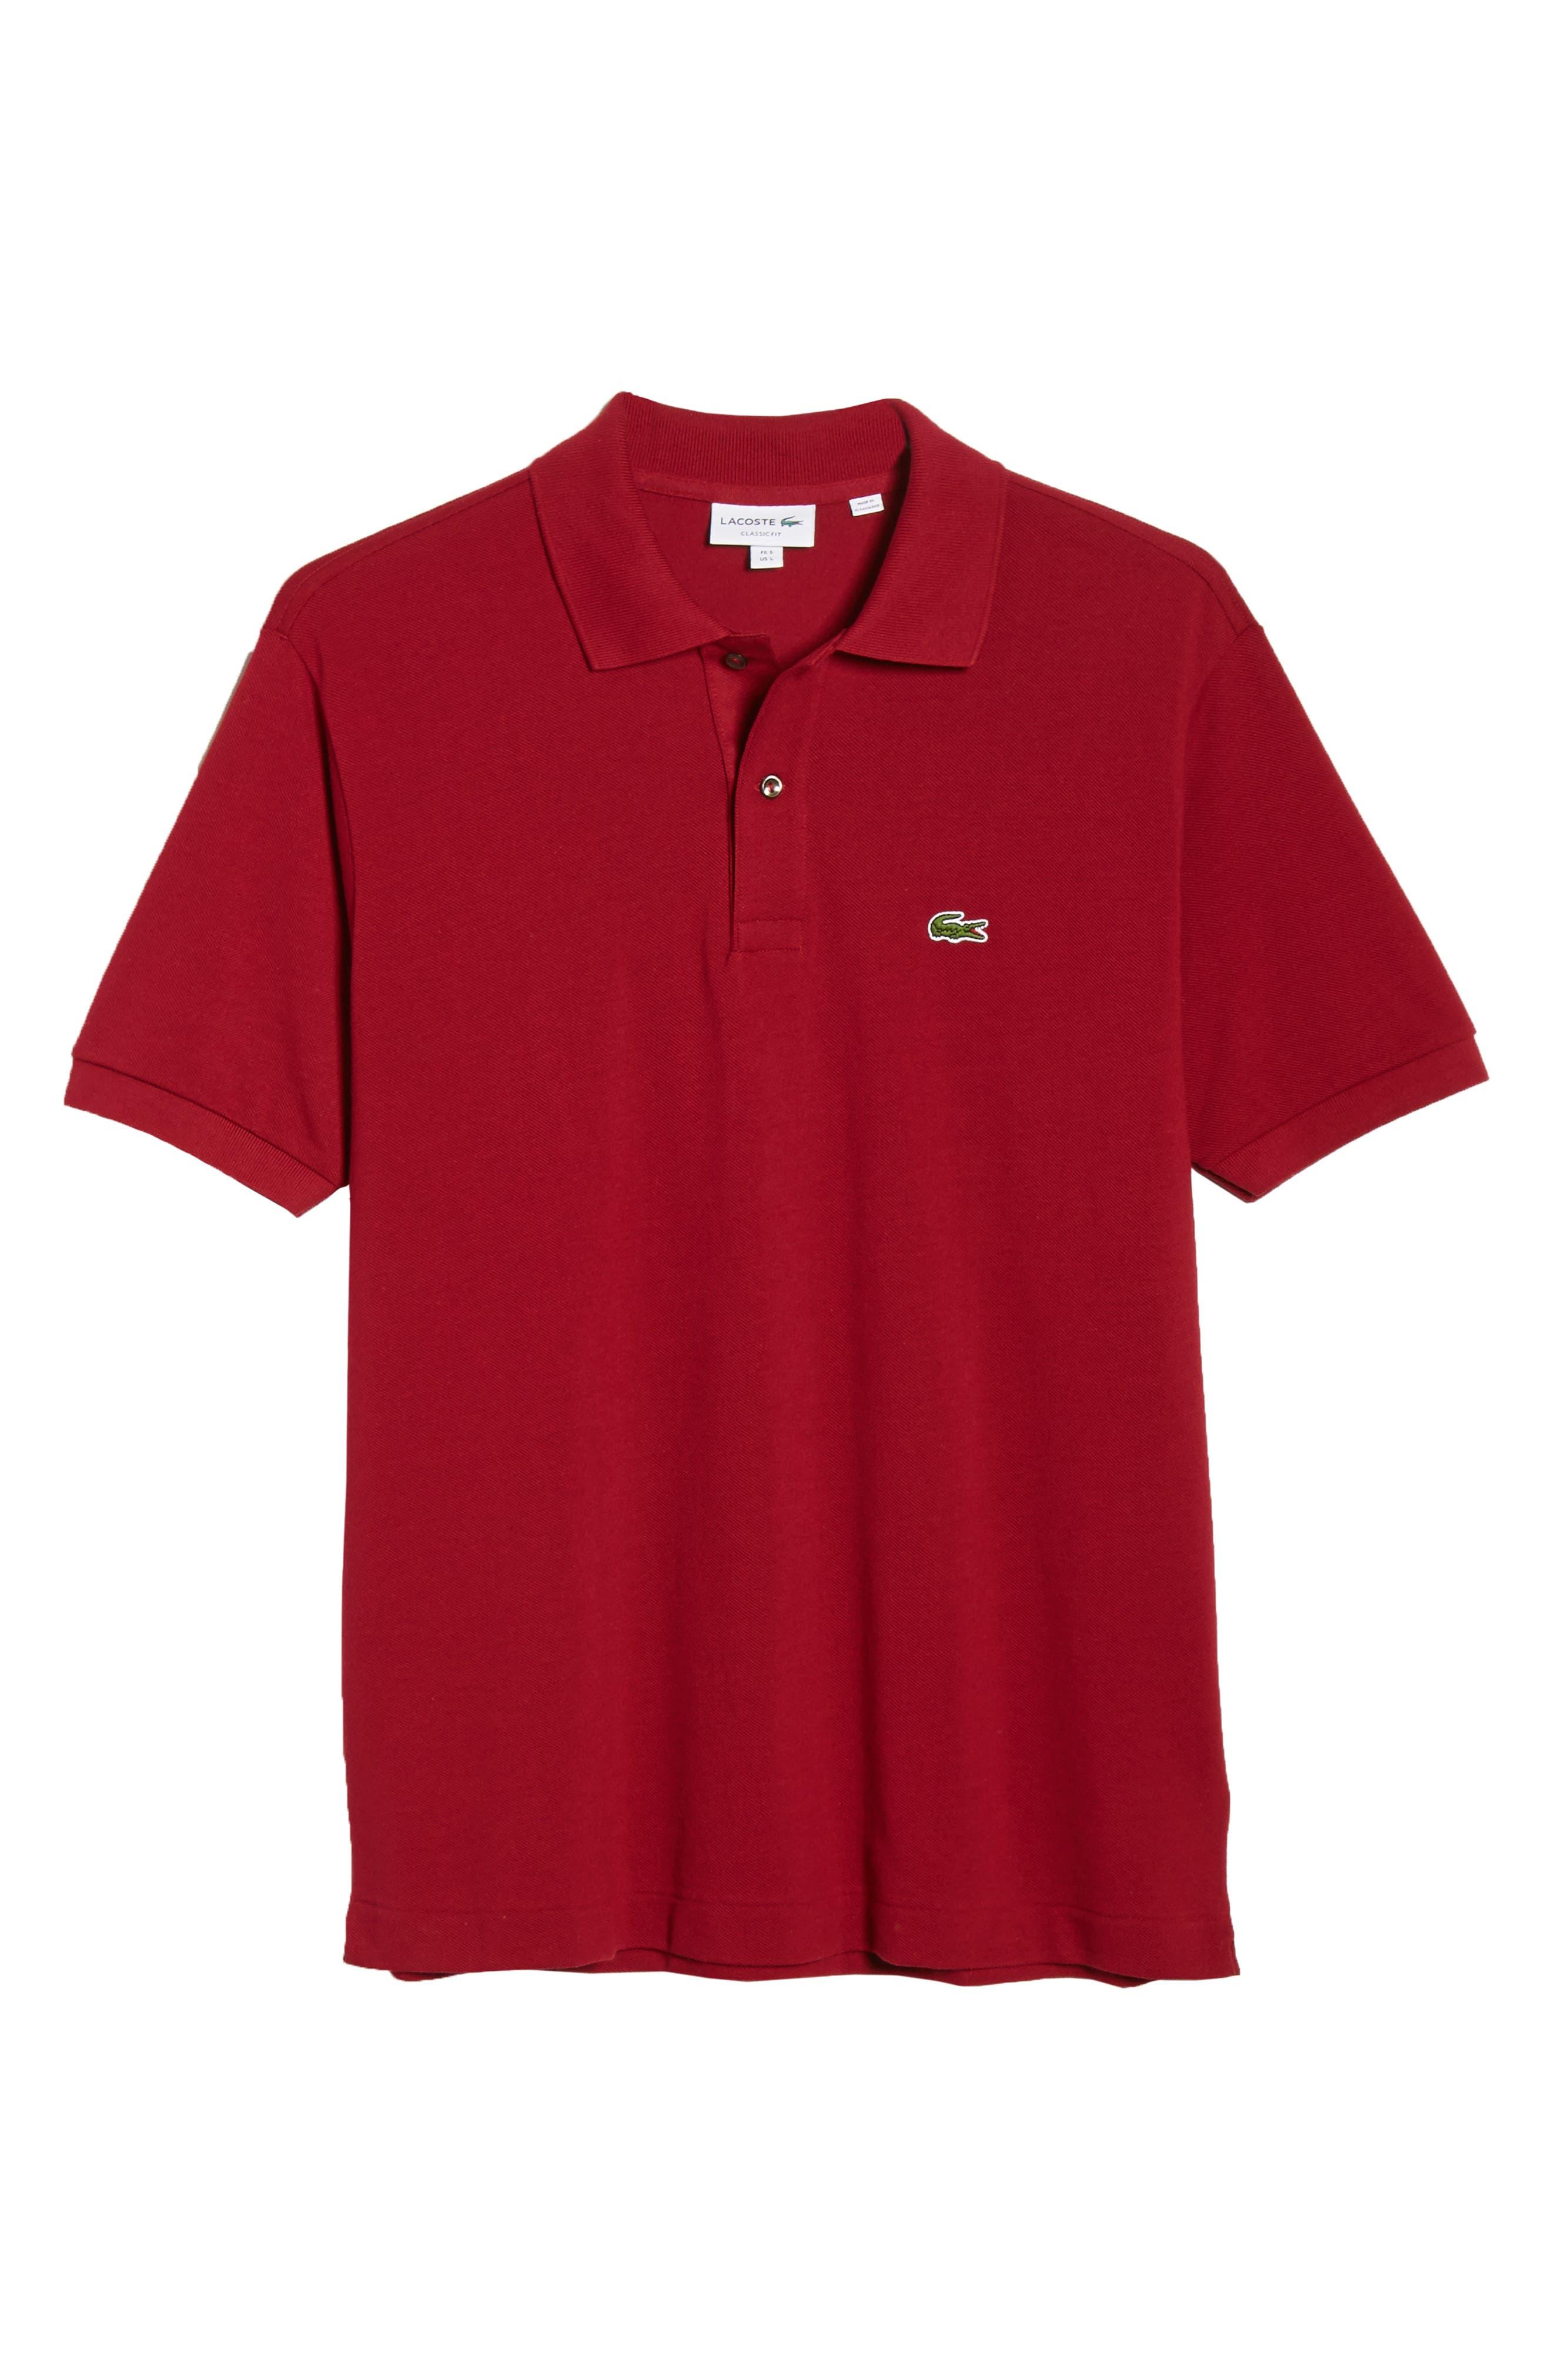 b1700e5c8eb08 Men's Lacoste Polo Shirts | Nordstrom